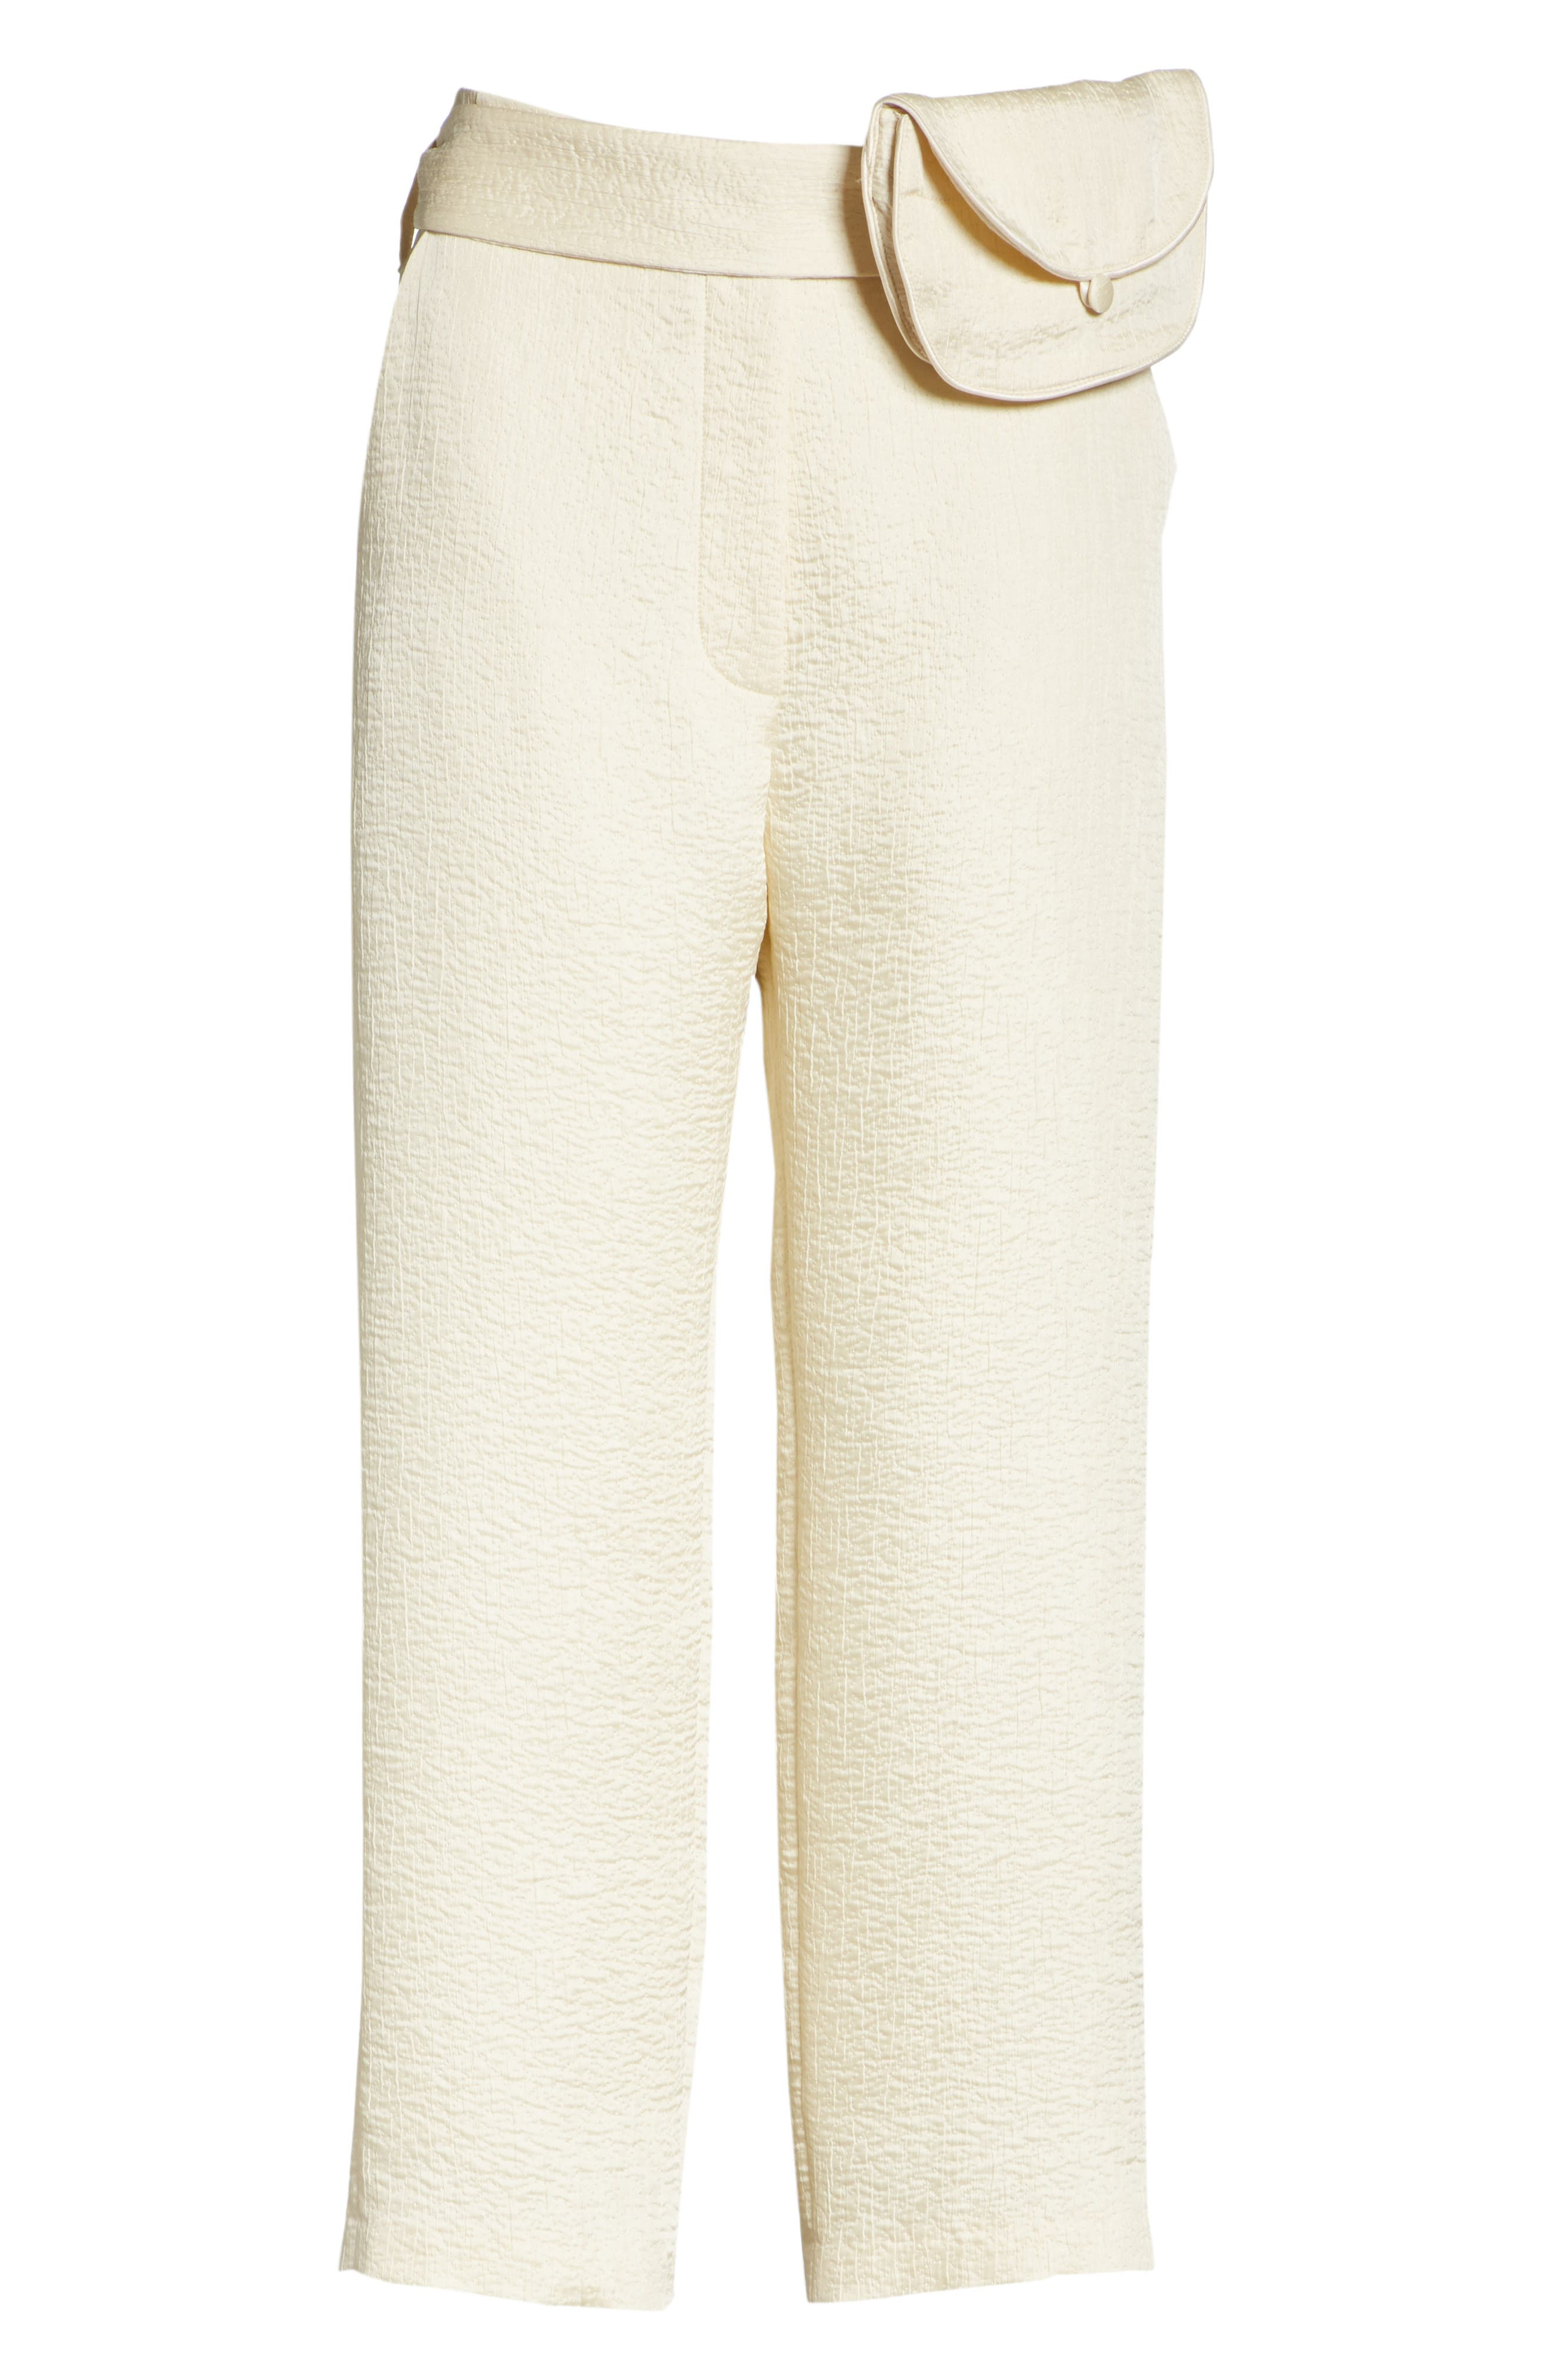 Raimo Belt Bag Crop Pants,                             Alternate thumbnail 6, color,                             900